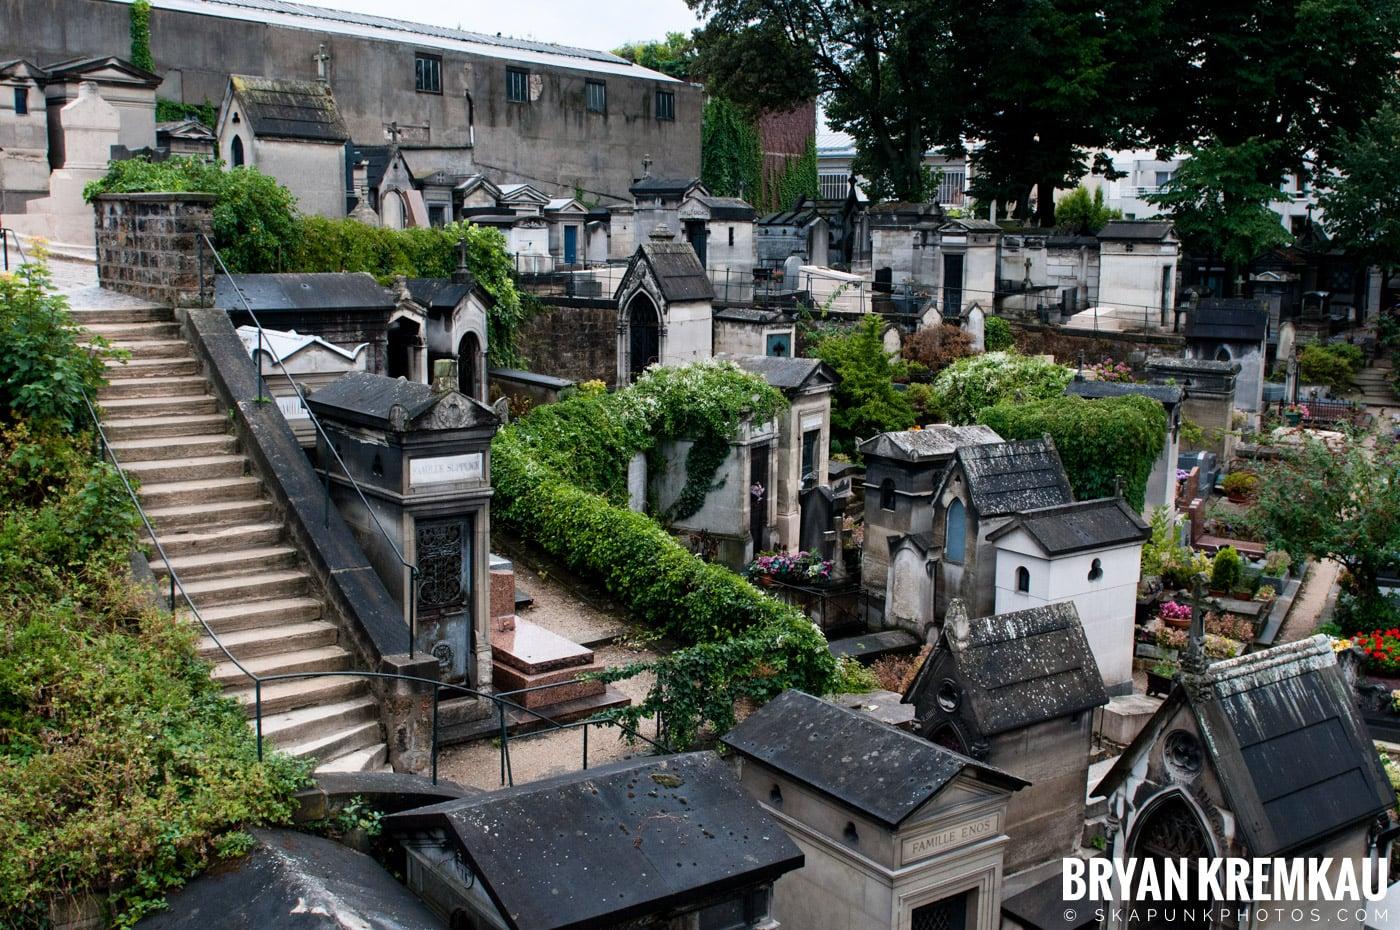 Paris, France Honeymoon - Day 6 - 7.23.11 (15)